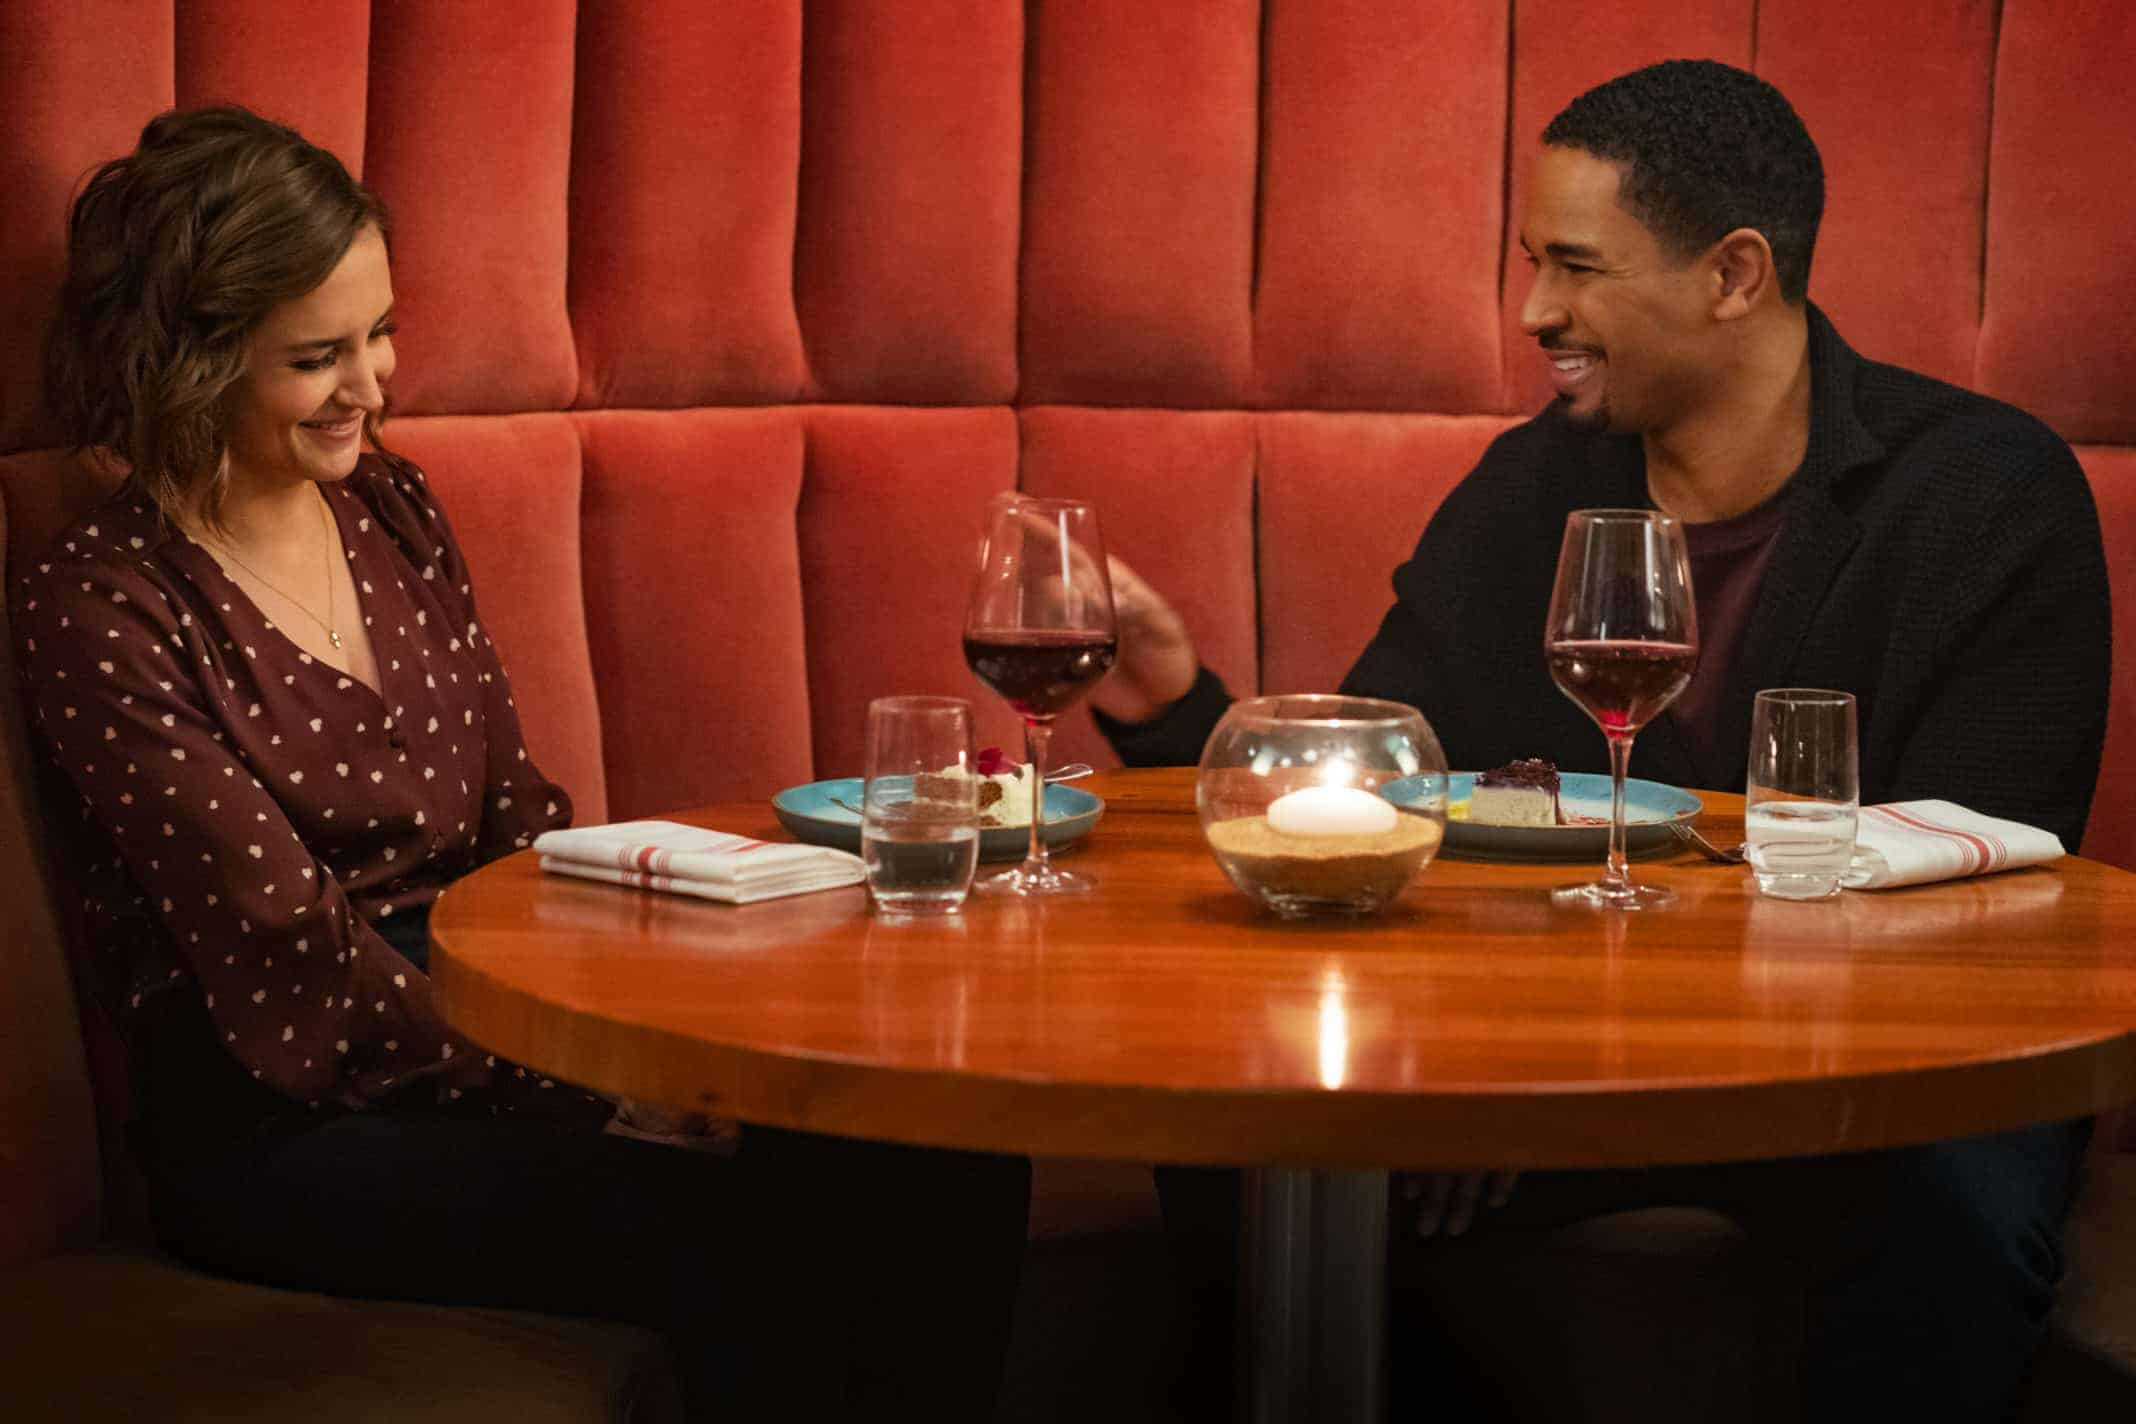 Susan (Rachel Leigh Cook) and Nick (Damon Wayans Jr) on a date.